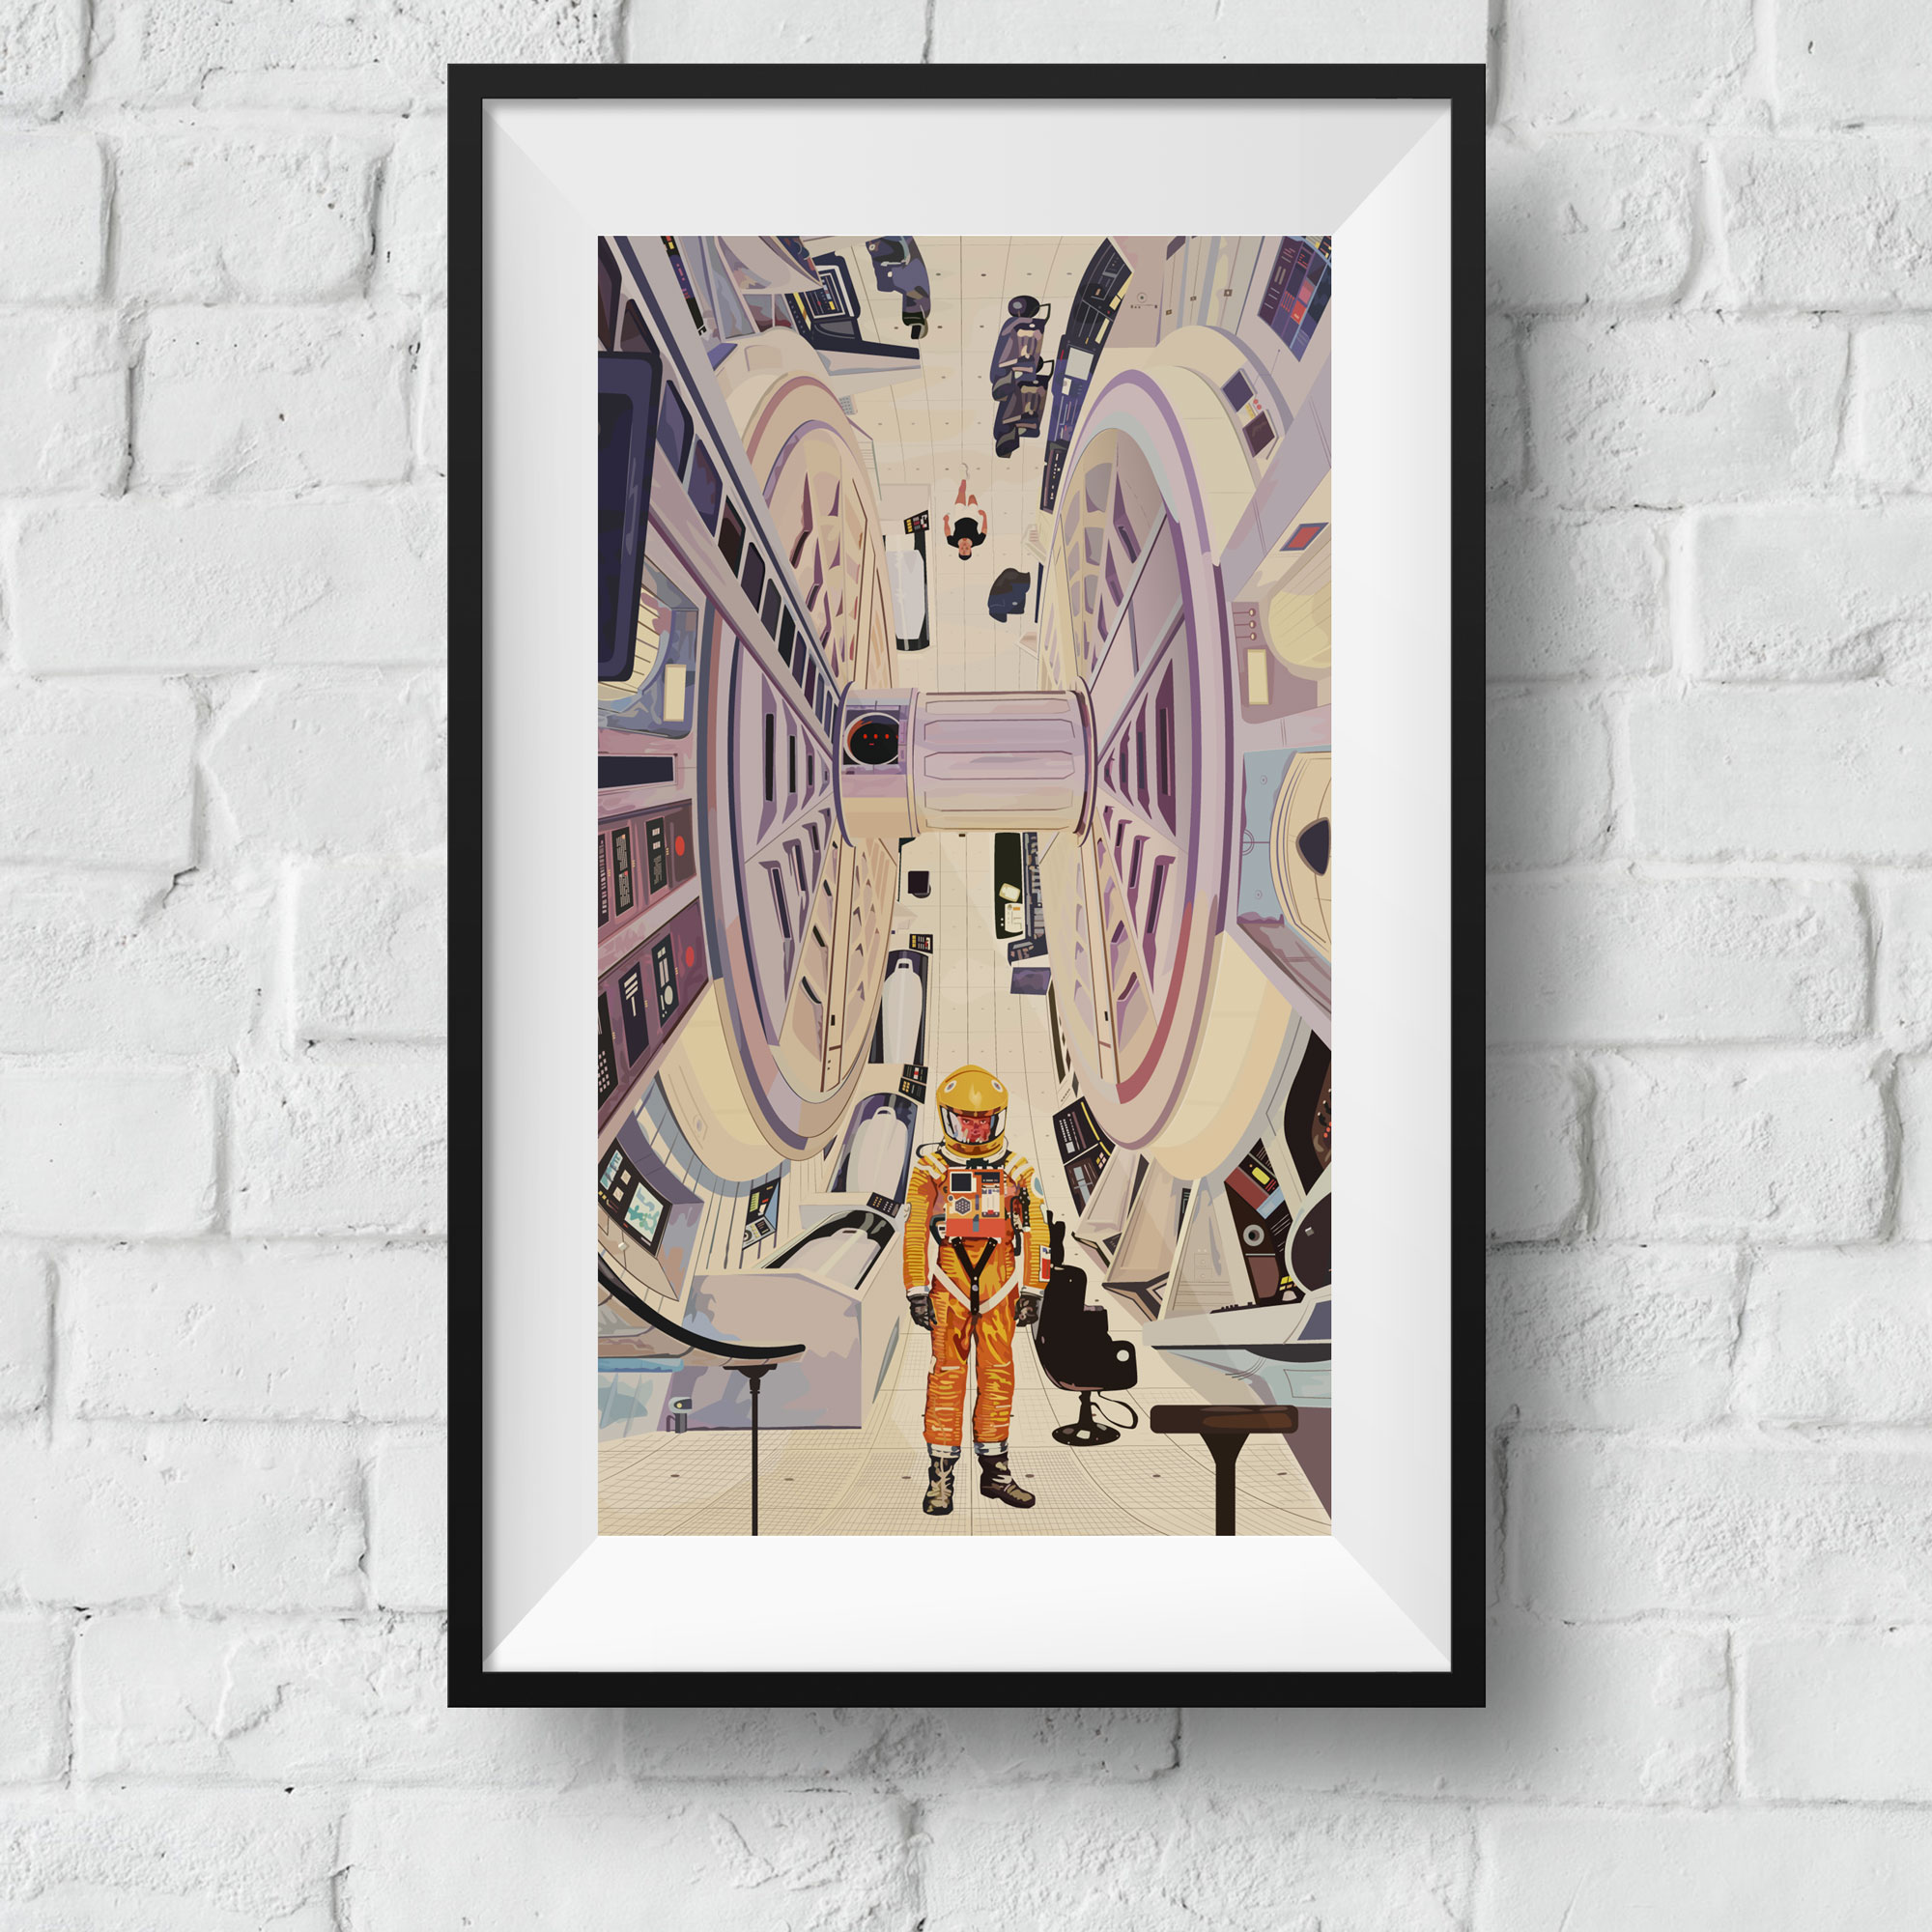 a-space-odyssey-framed